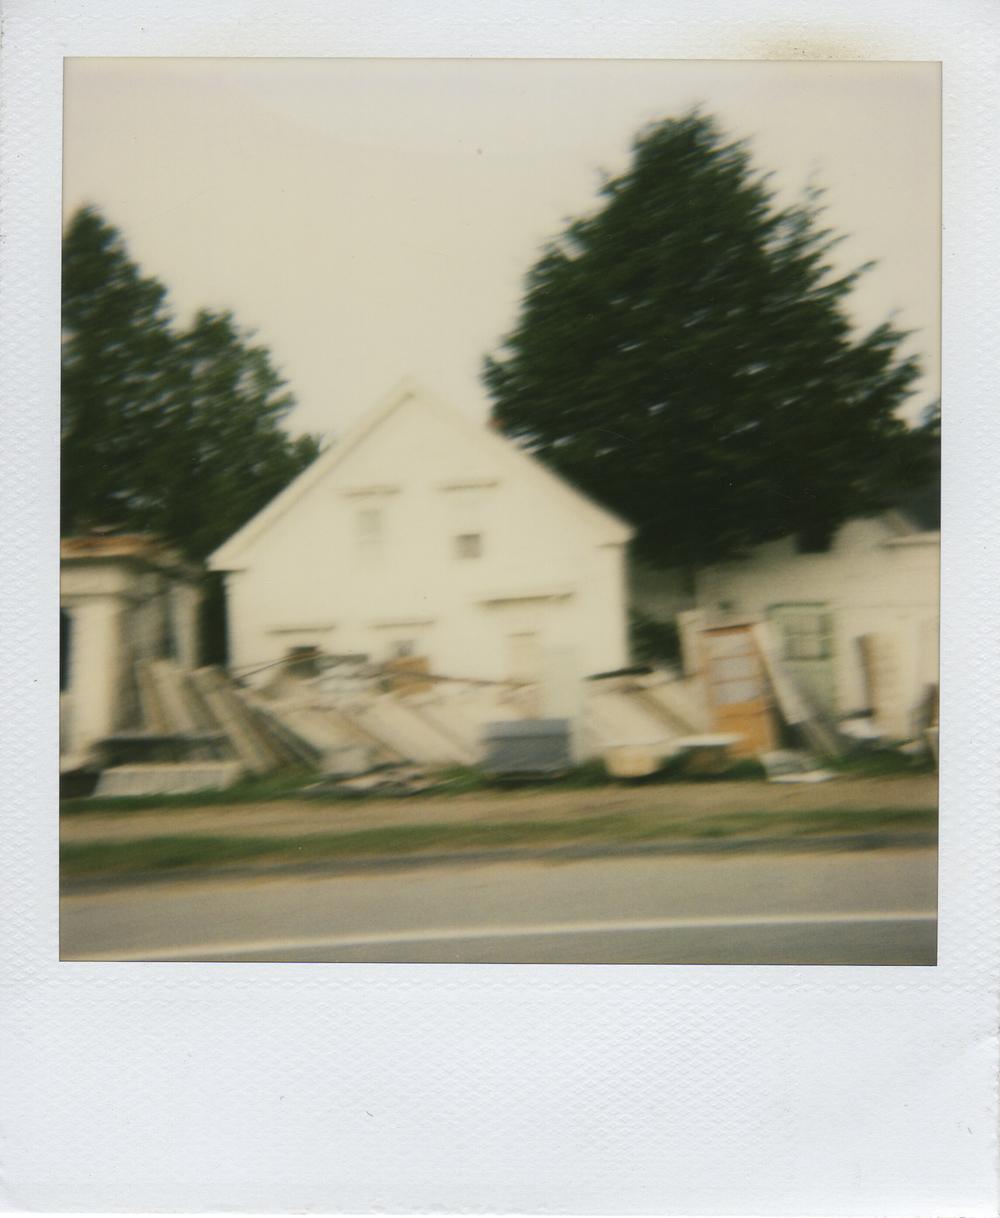 jlaurence-polaroid-147.jpg